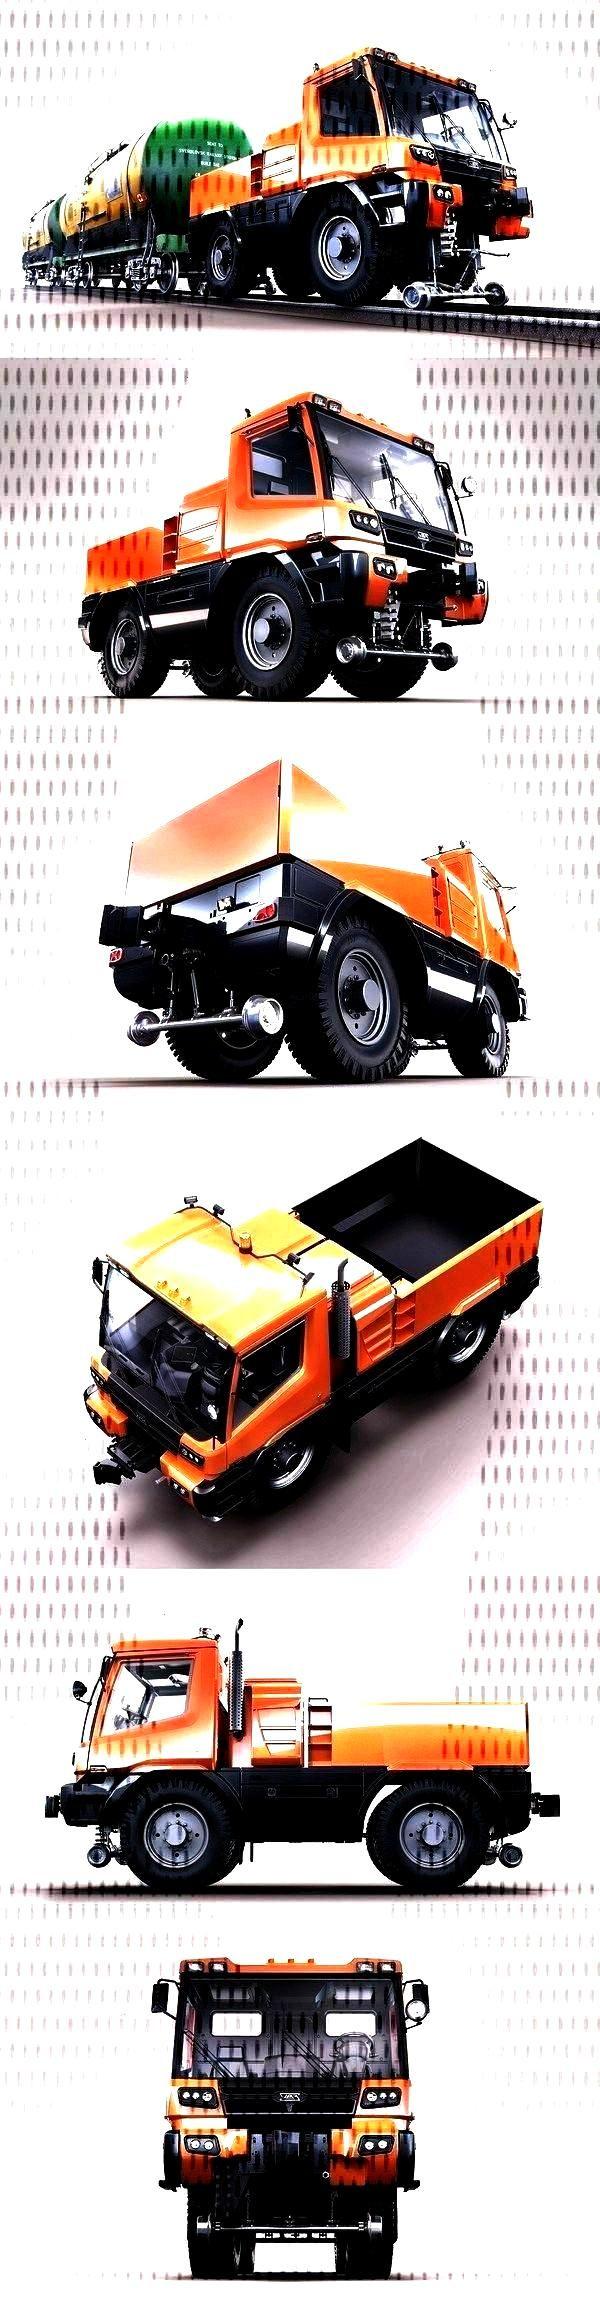 Terrain Vehicles /bonetech3d conceptart concept photography animations scifi steampunk steaAll